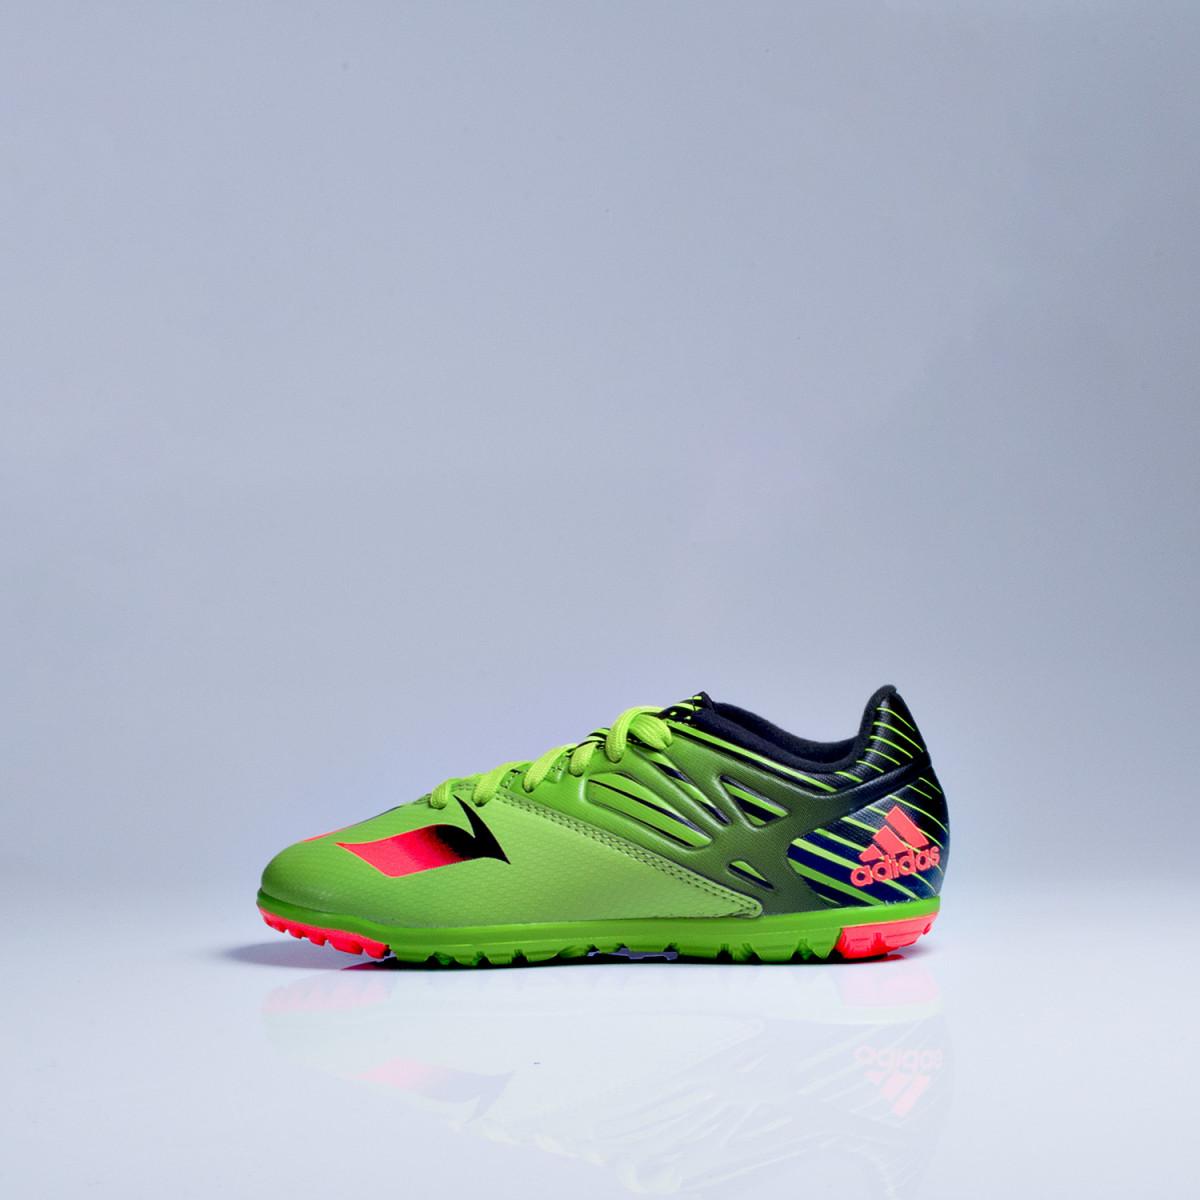 promo code 7fcb8 13a40 Botines Adidas Messi 15.3 TF J Kids